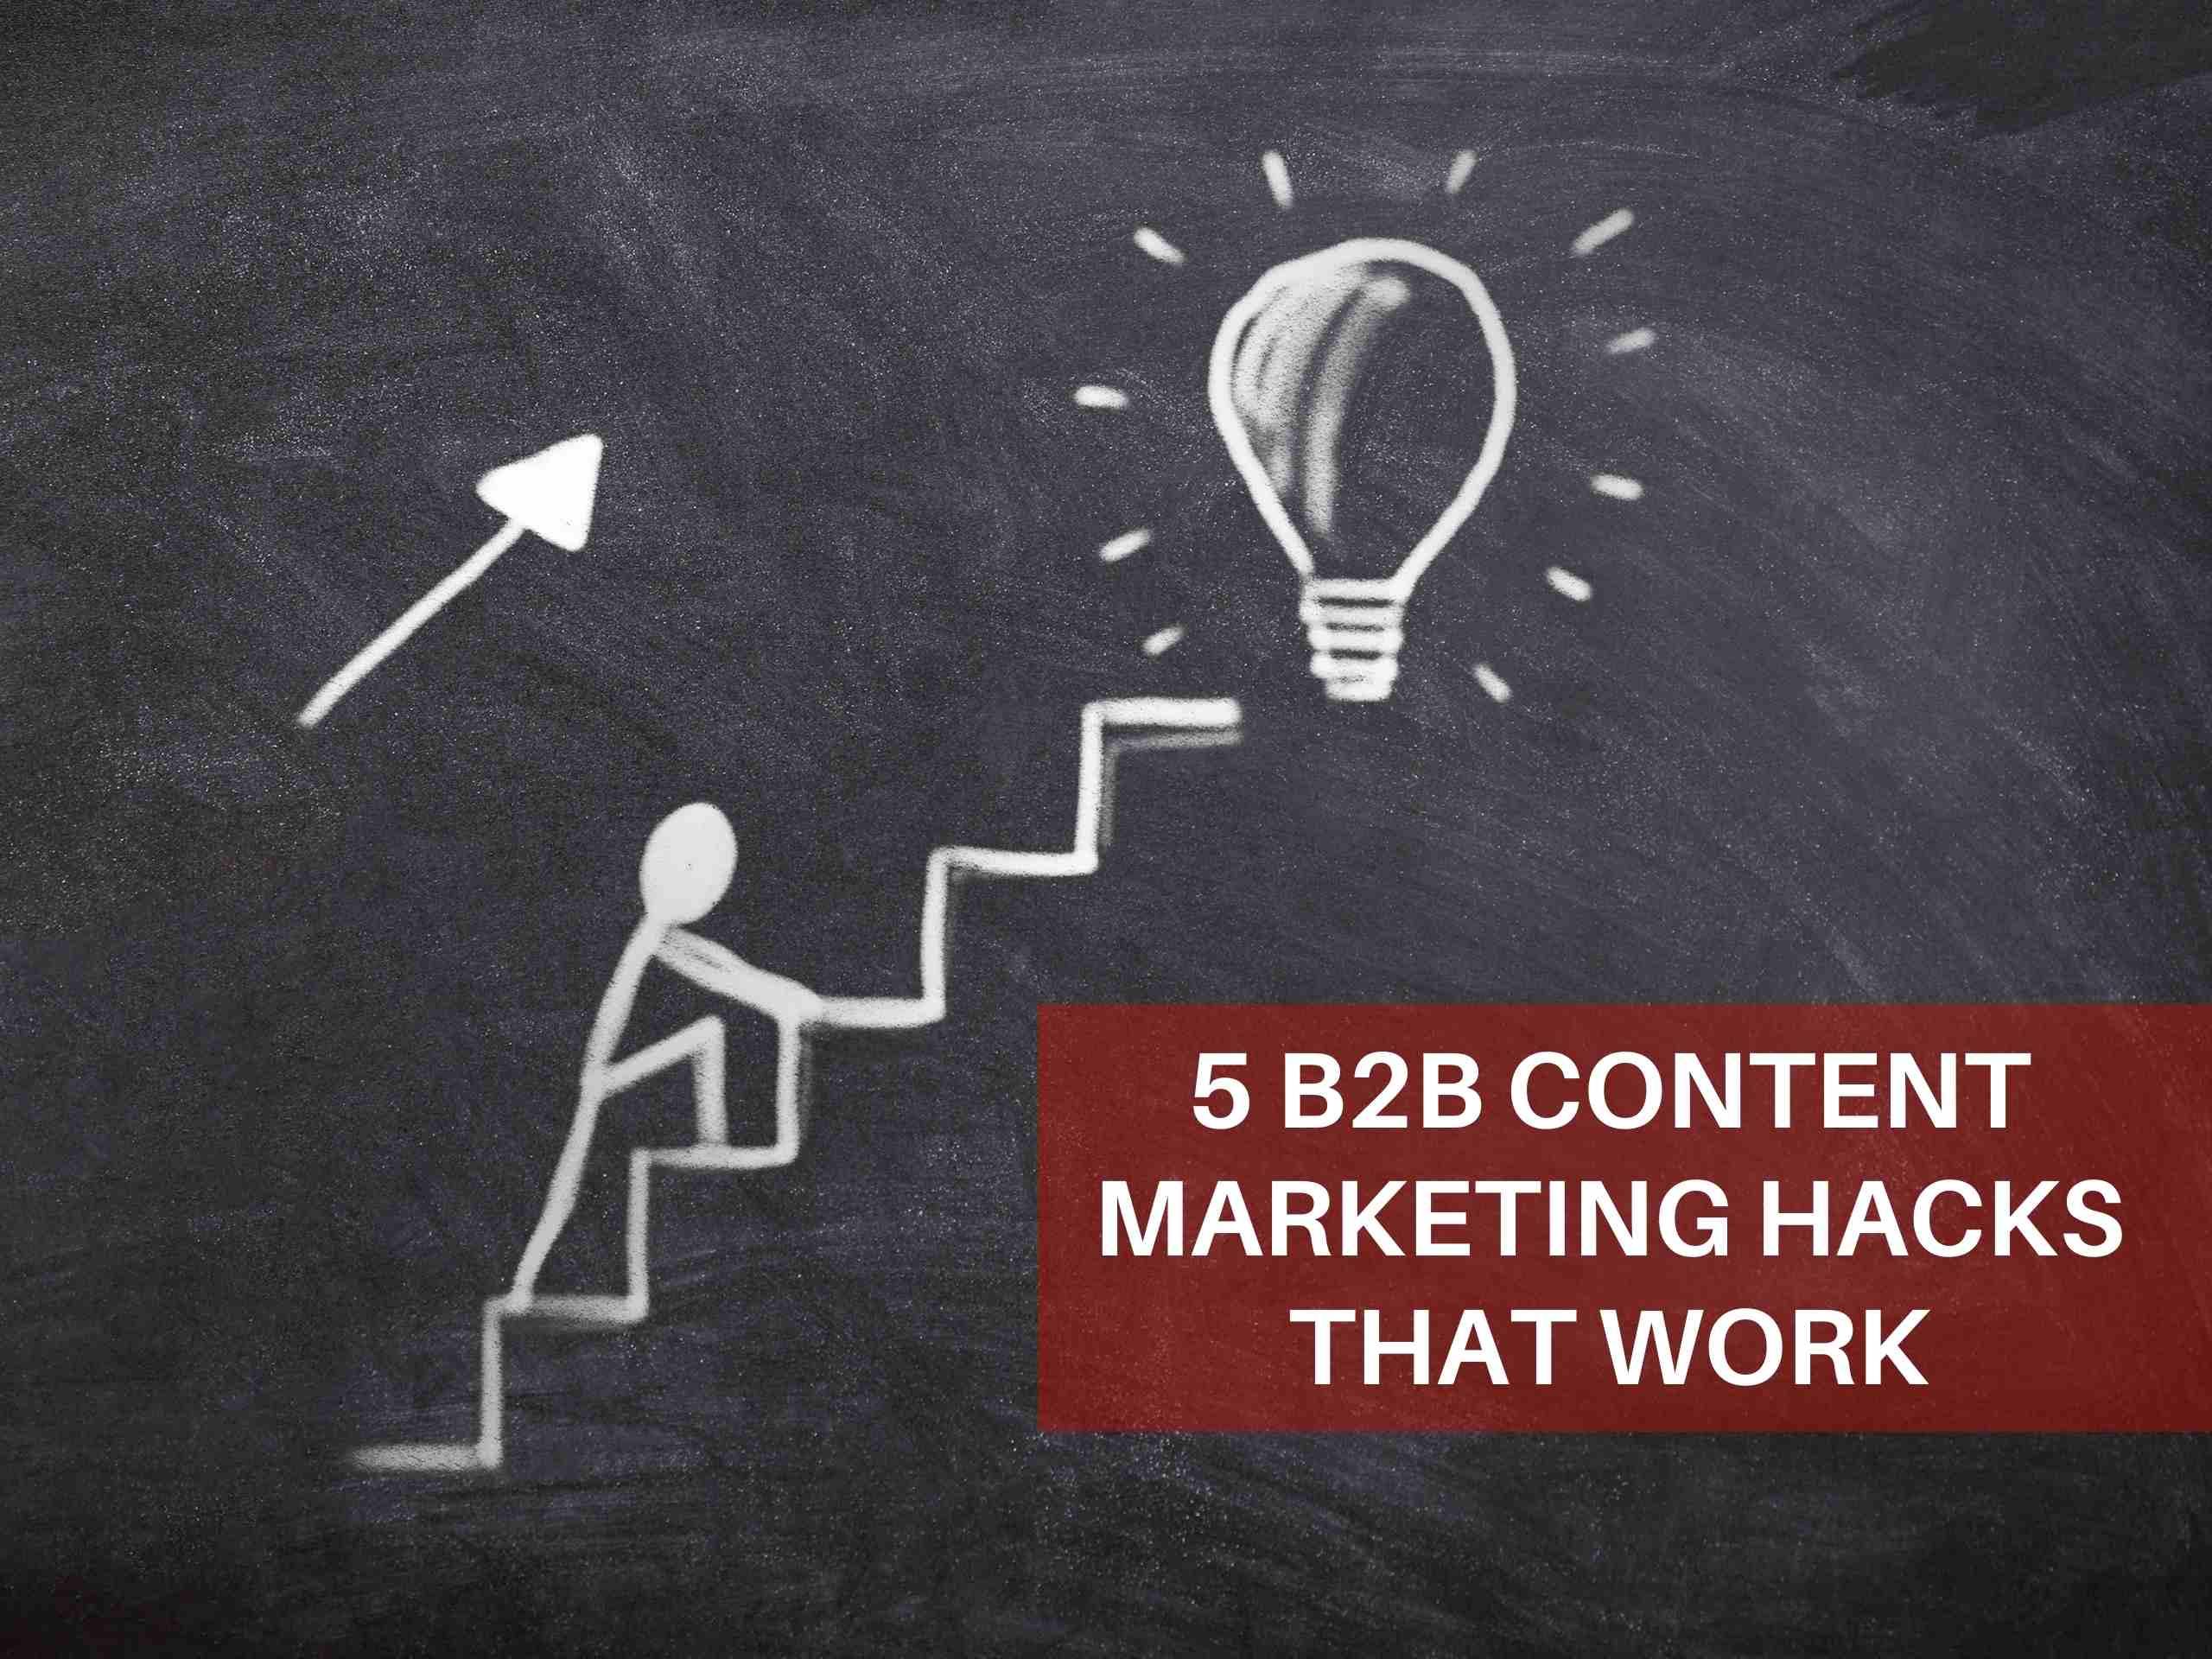 5 B2B Content Marketing Hacks That Work